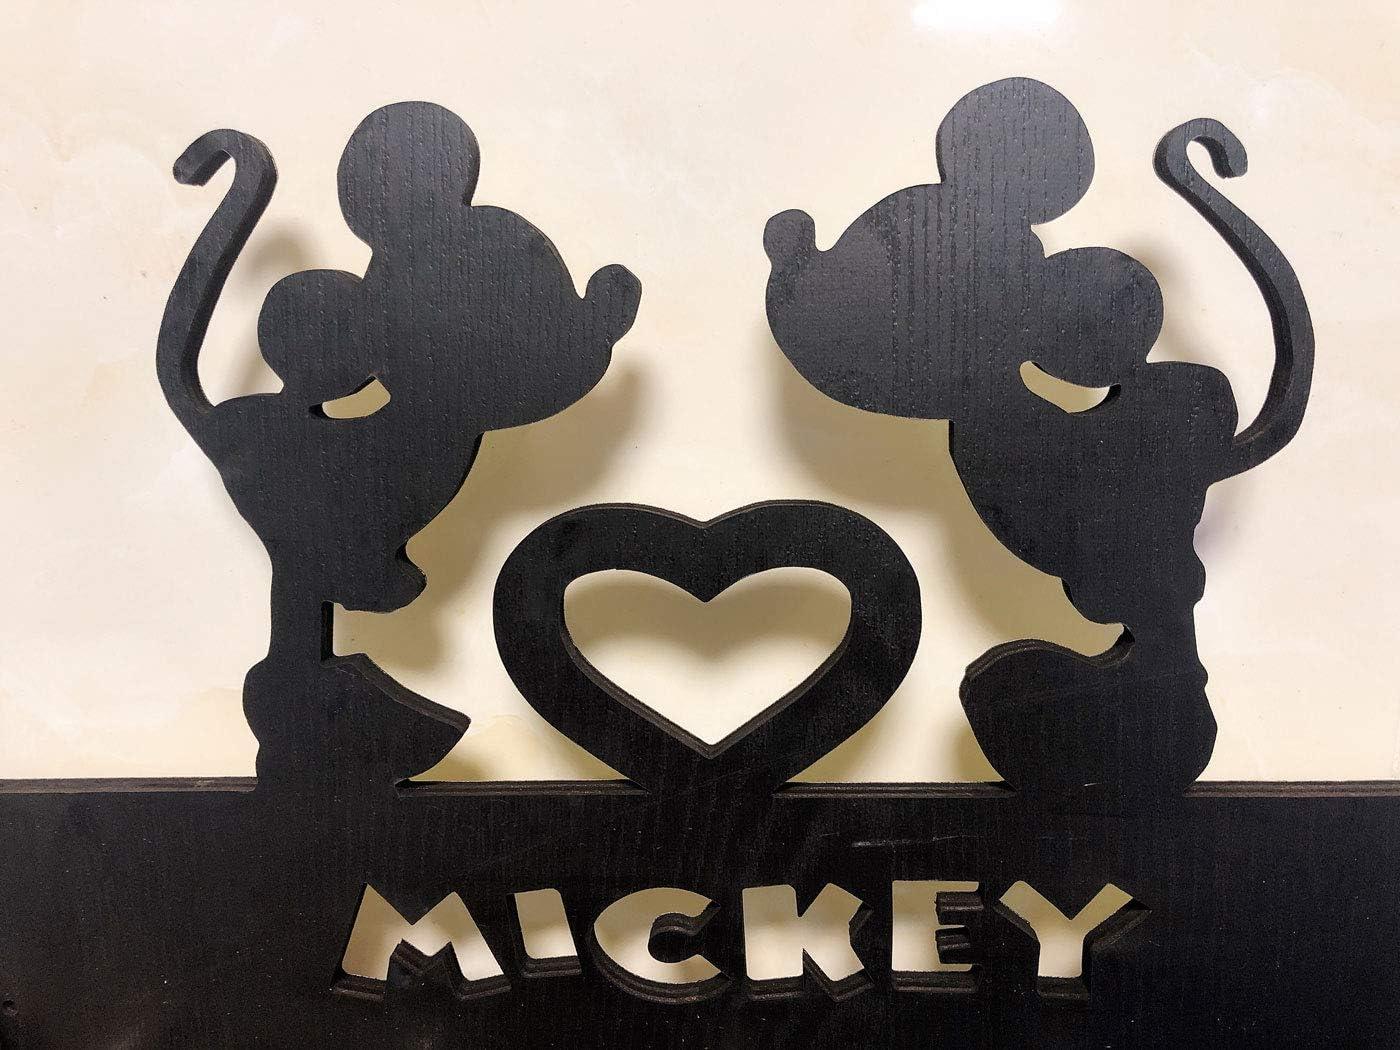 Max Mick Door Hooks,Disney Mickey Mouse Cartoon Animation Coat Hooks,Key Holder,Key Hanger for Wall、Entryway and Living Room Unigue Gift-5 Hooks-20LB